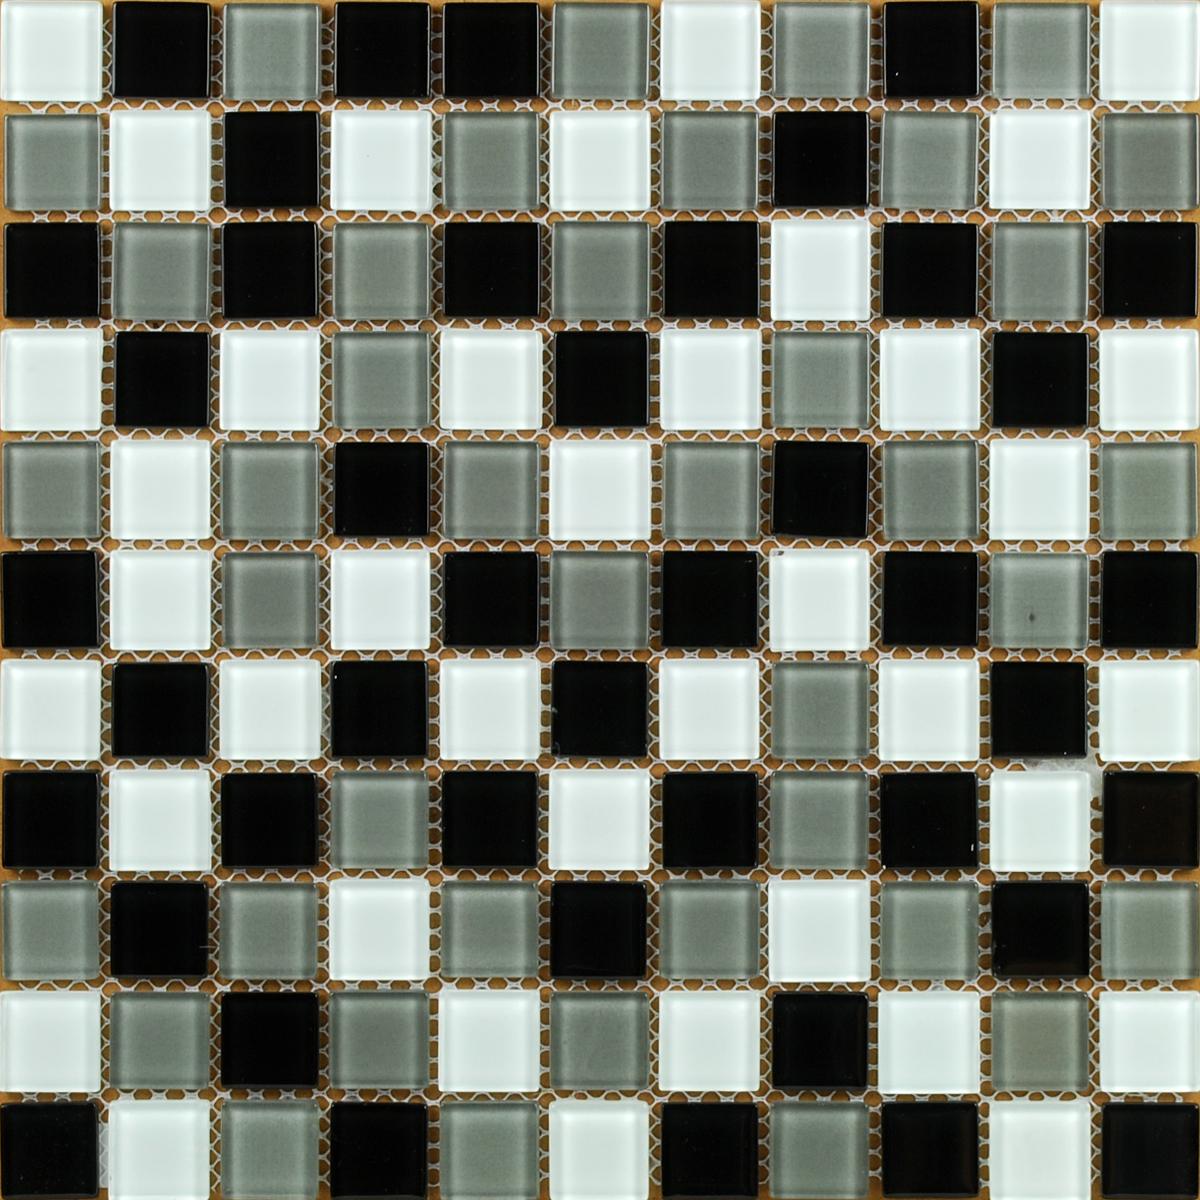 Crystal Glass Mosaic Tile Art Wall Kl026 Kitchen